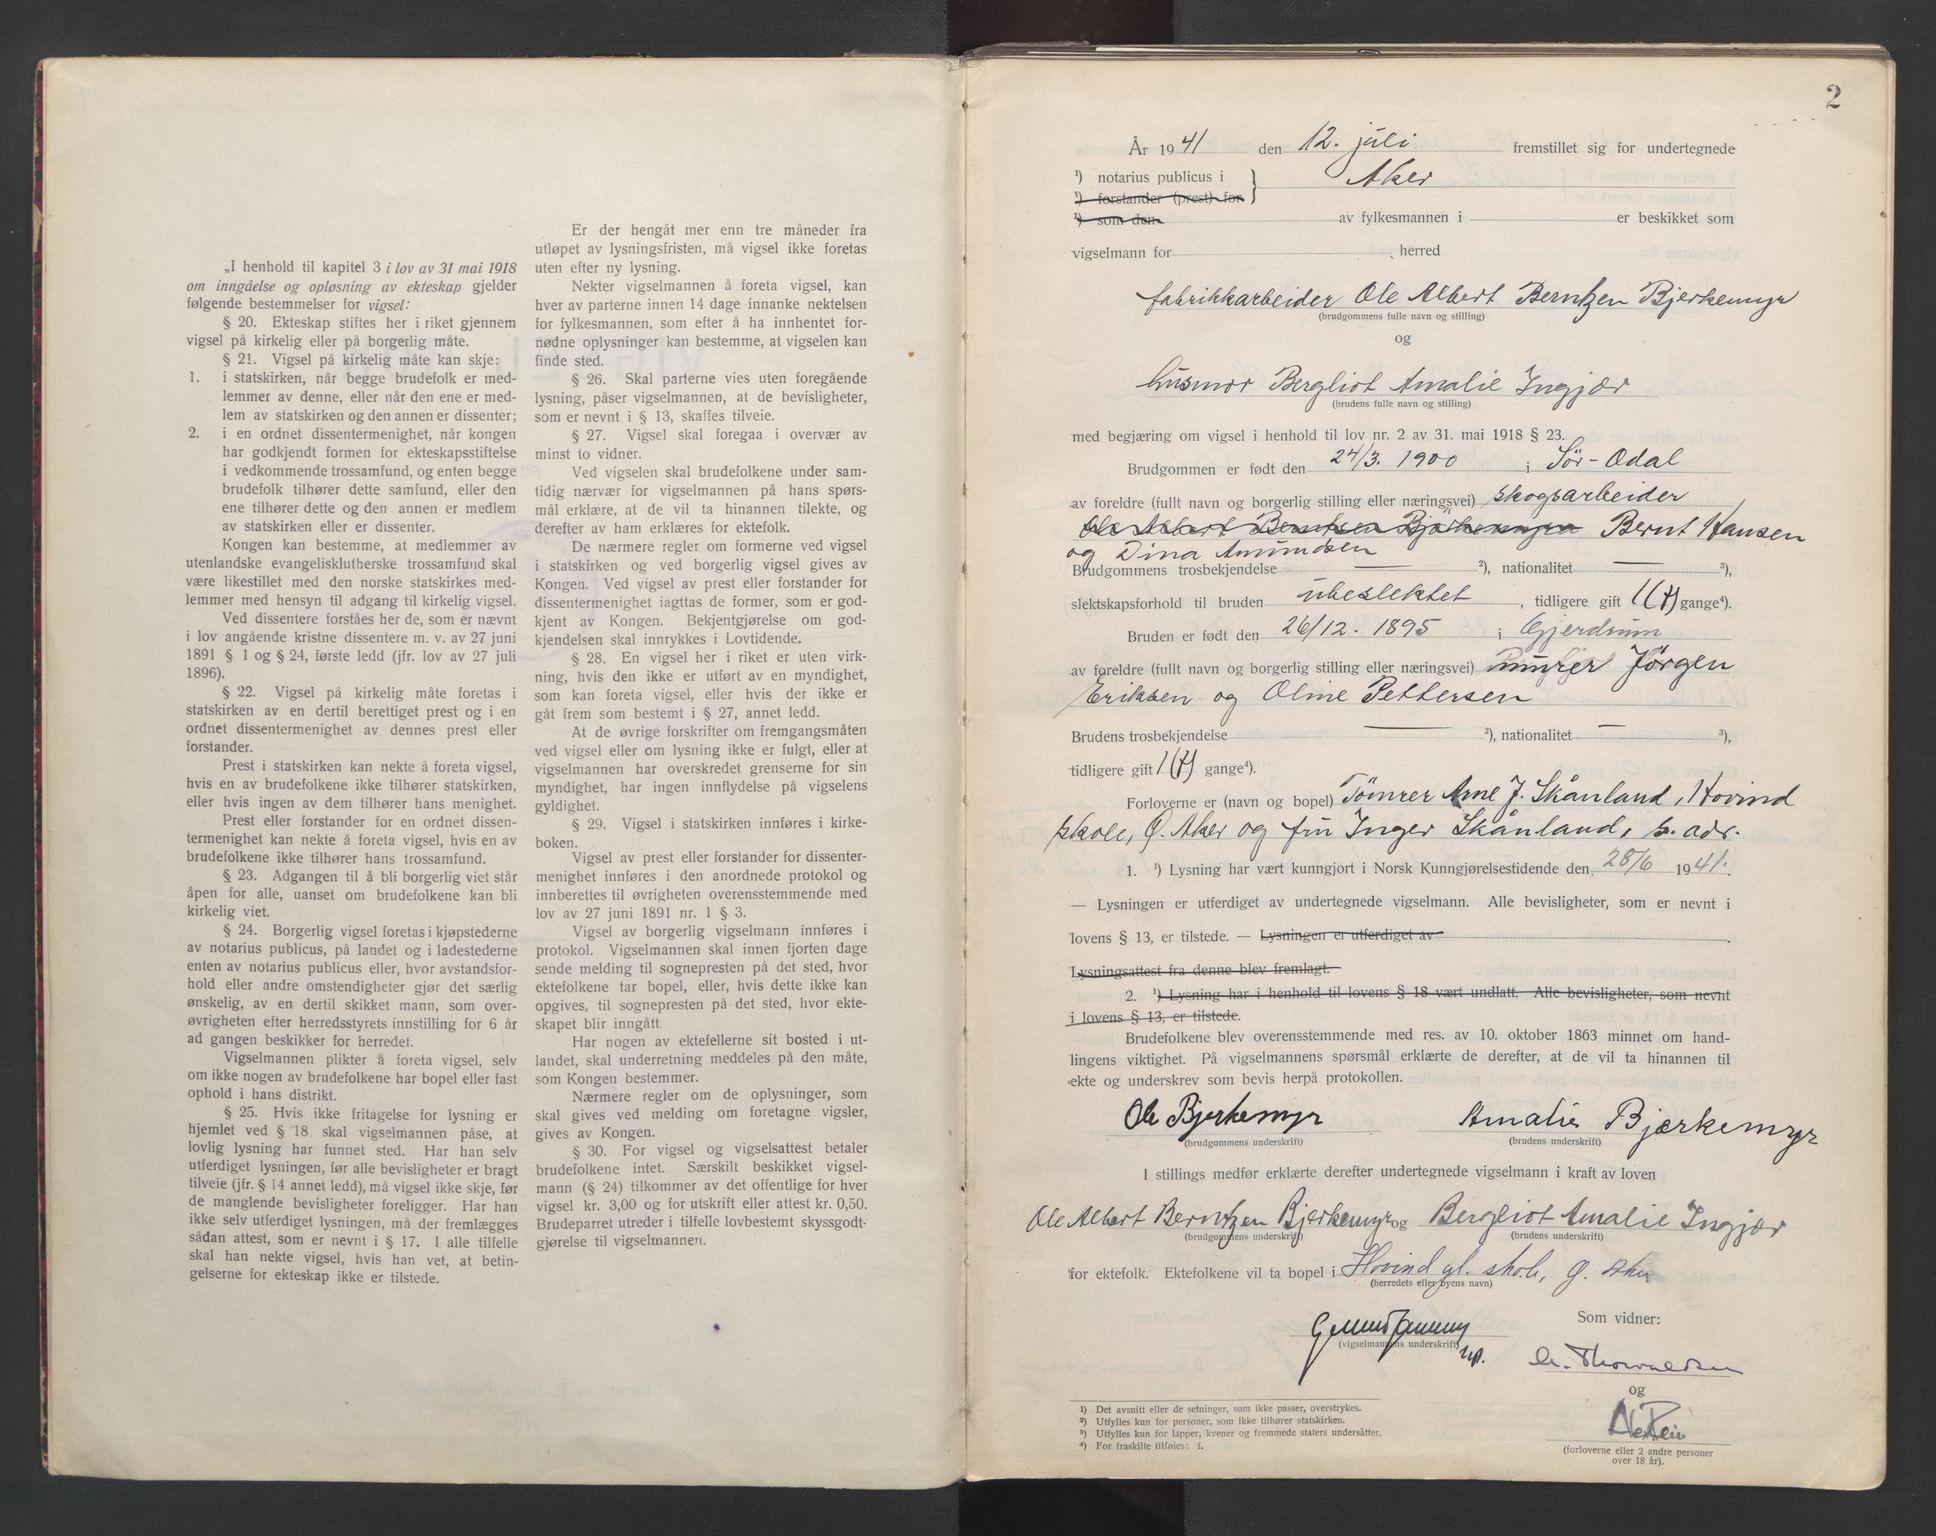 SAO, Aker sorenskriveri, L/Lc/Lcb/L0014: Vigselprotokoll, 1941-1942, s. 2